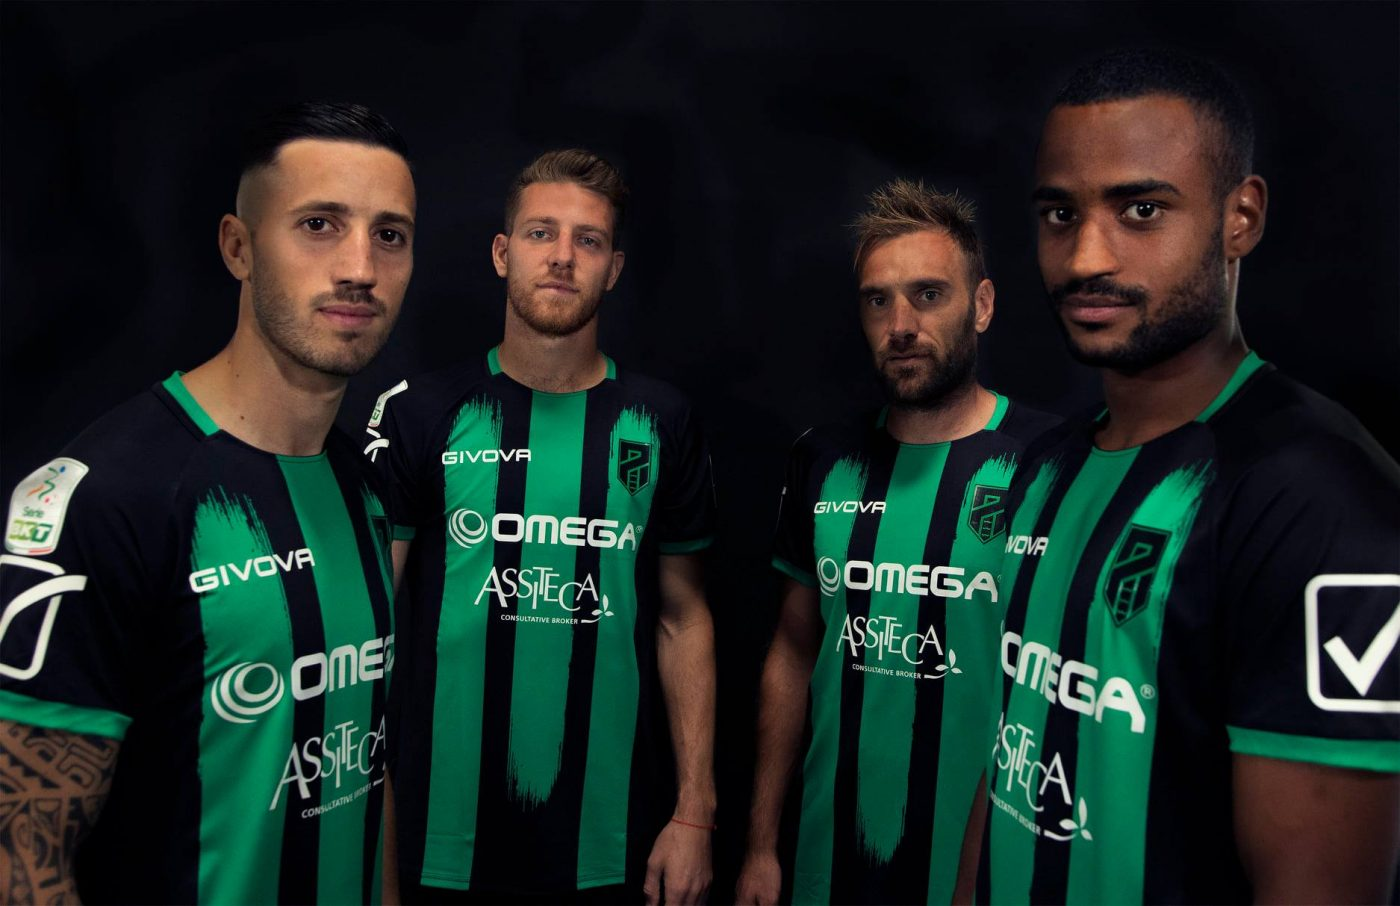 Pordenona nuova maglia 2020-21 Givova